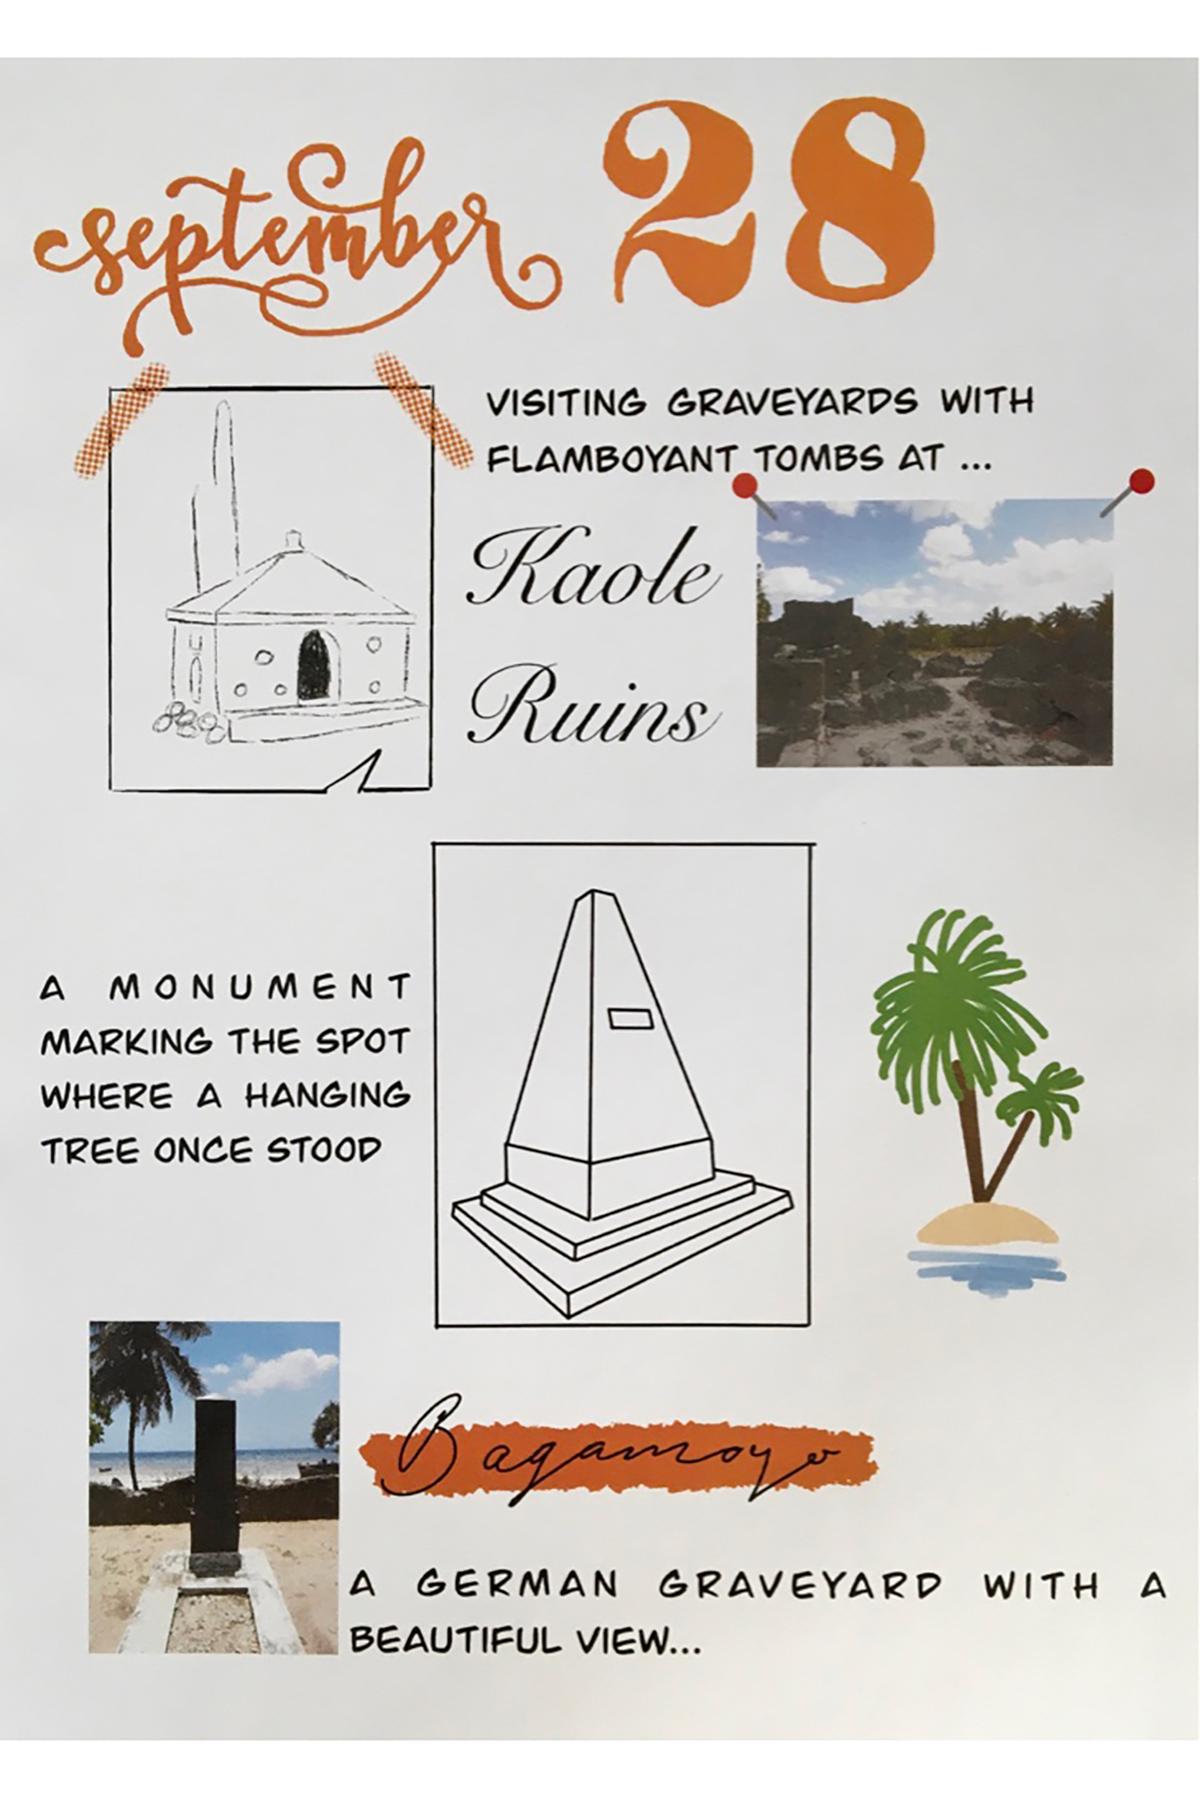 Reisetagebuch vom Besuch in Tansania 2019